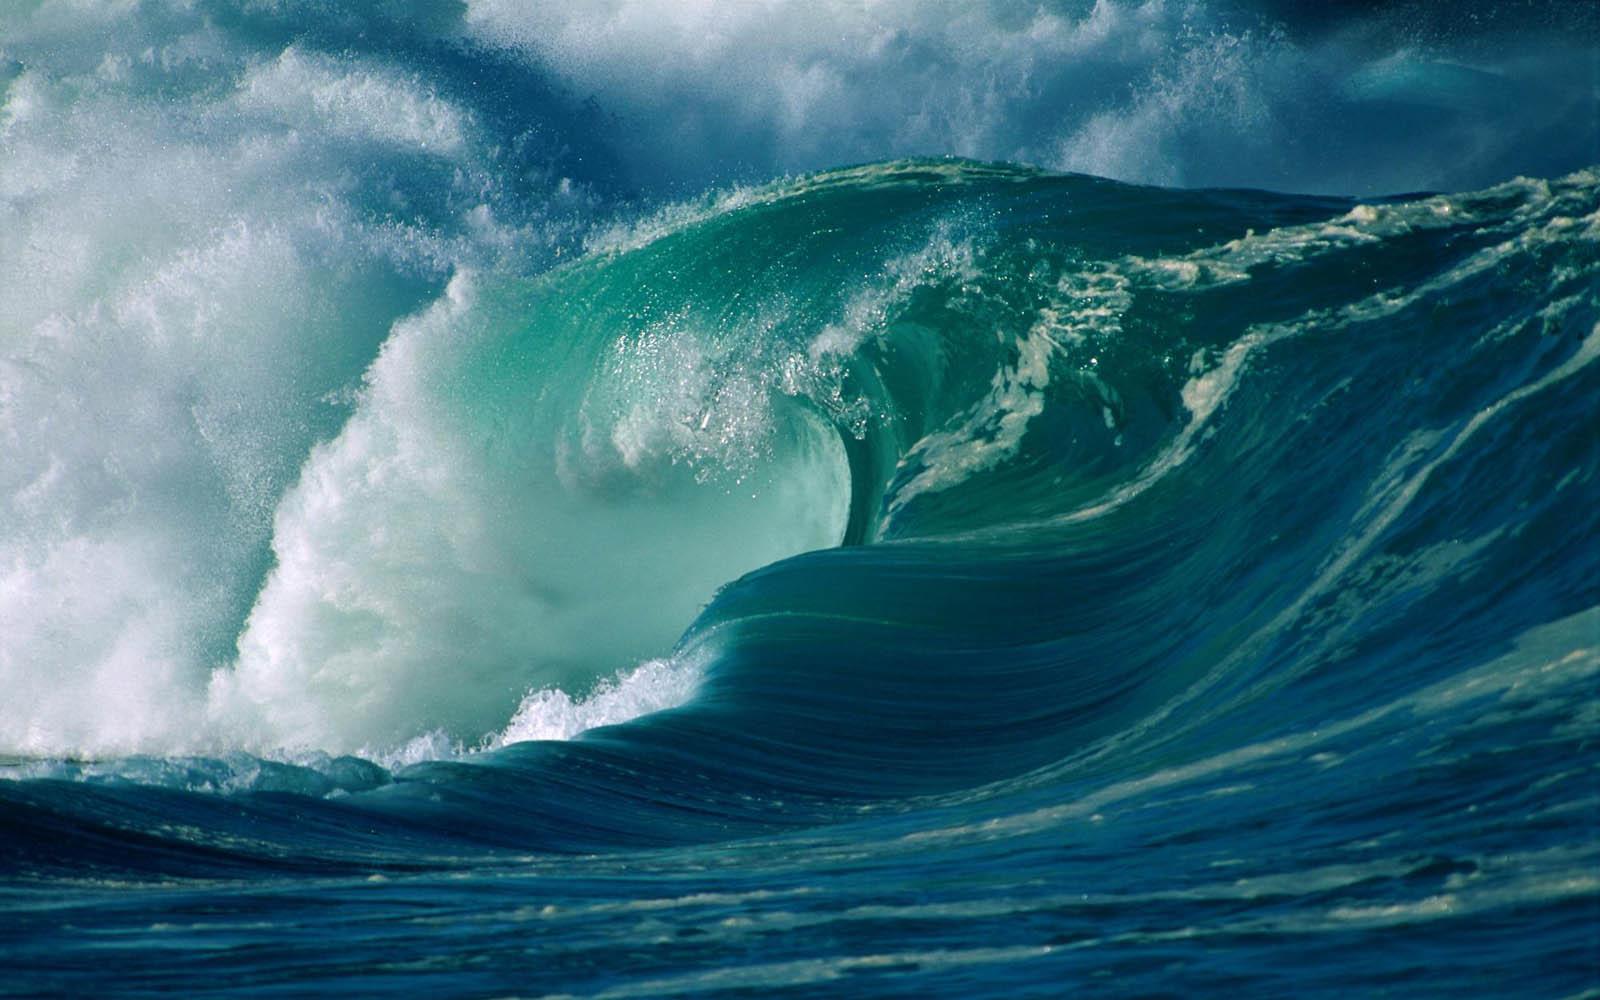 Free Download Wallpapers Big Wave Wallpapers 1600x1000 For Your Desktop Mobile Tablet Explore 66 Wave Wallpapers Sea Wallpaper Ocean Waves Wallpaper Blue Wave Wallpaper